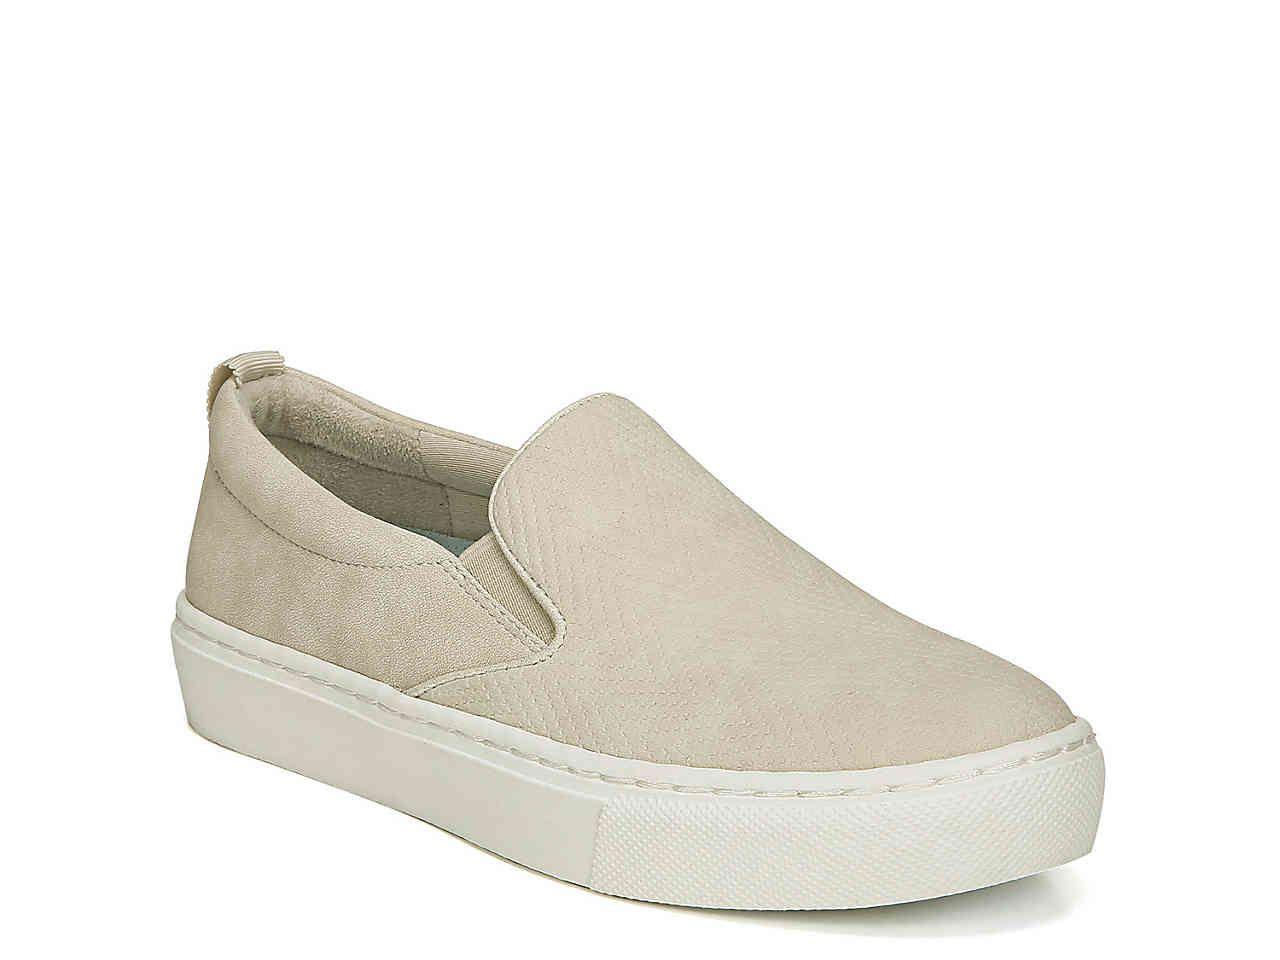 Slip on sneaker, Dr scholls shoes sneakers